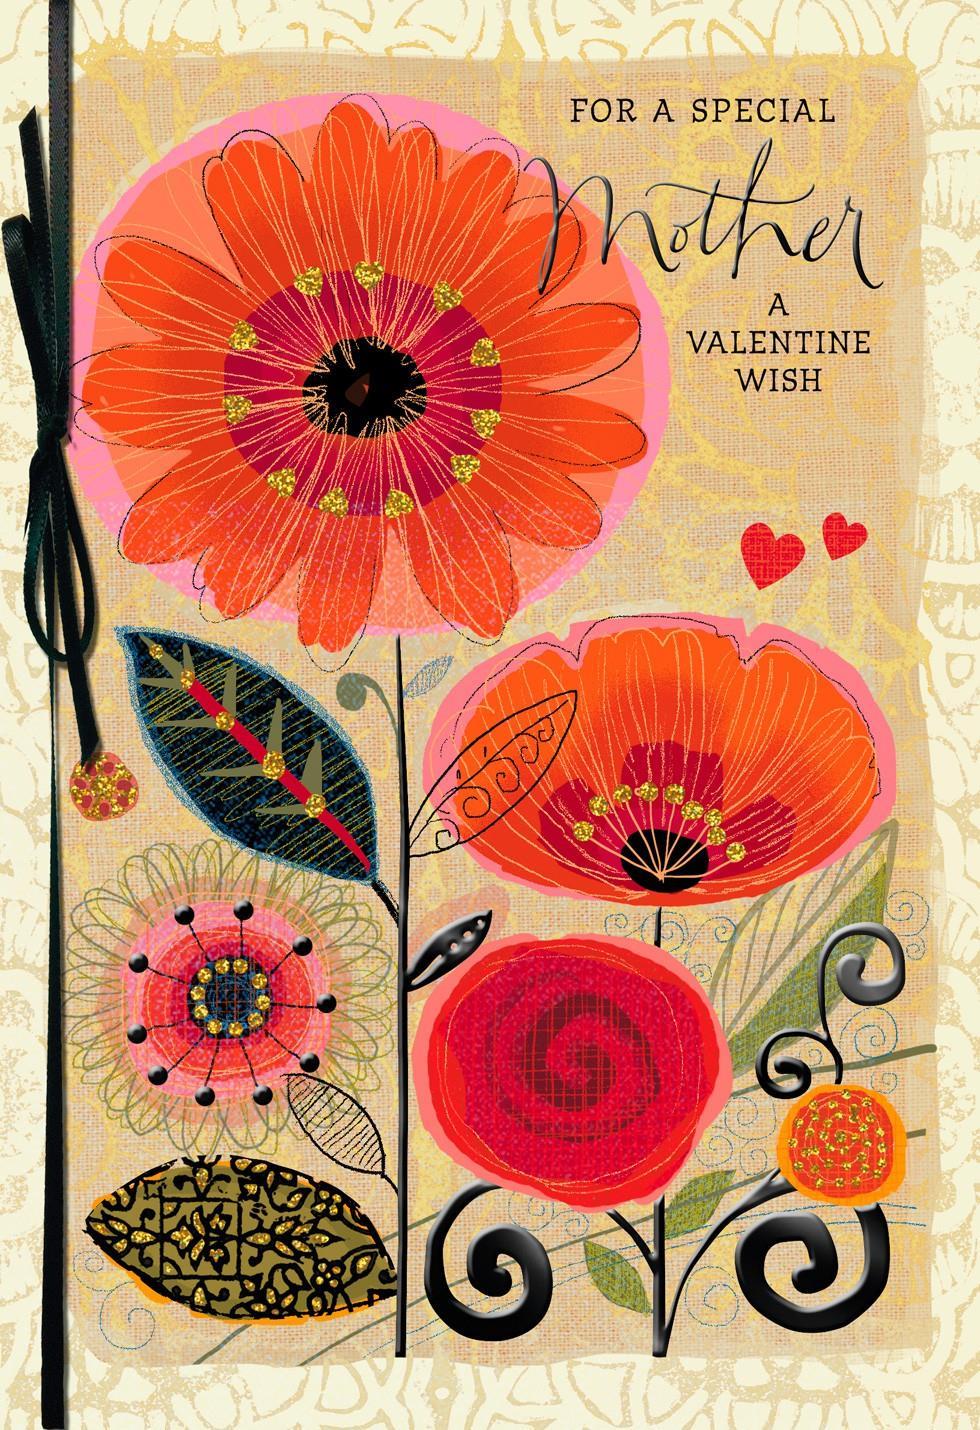 loving wishes for mom valentines day card - Mom Valentine